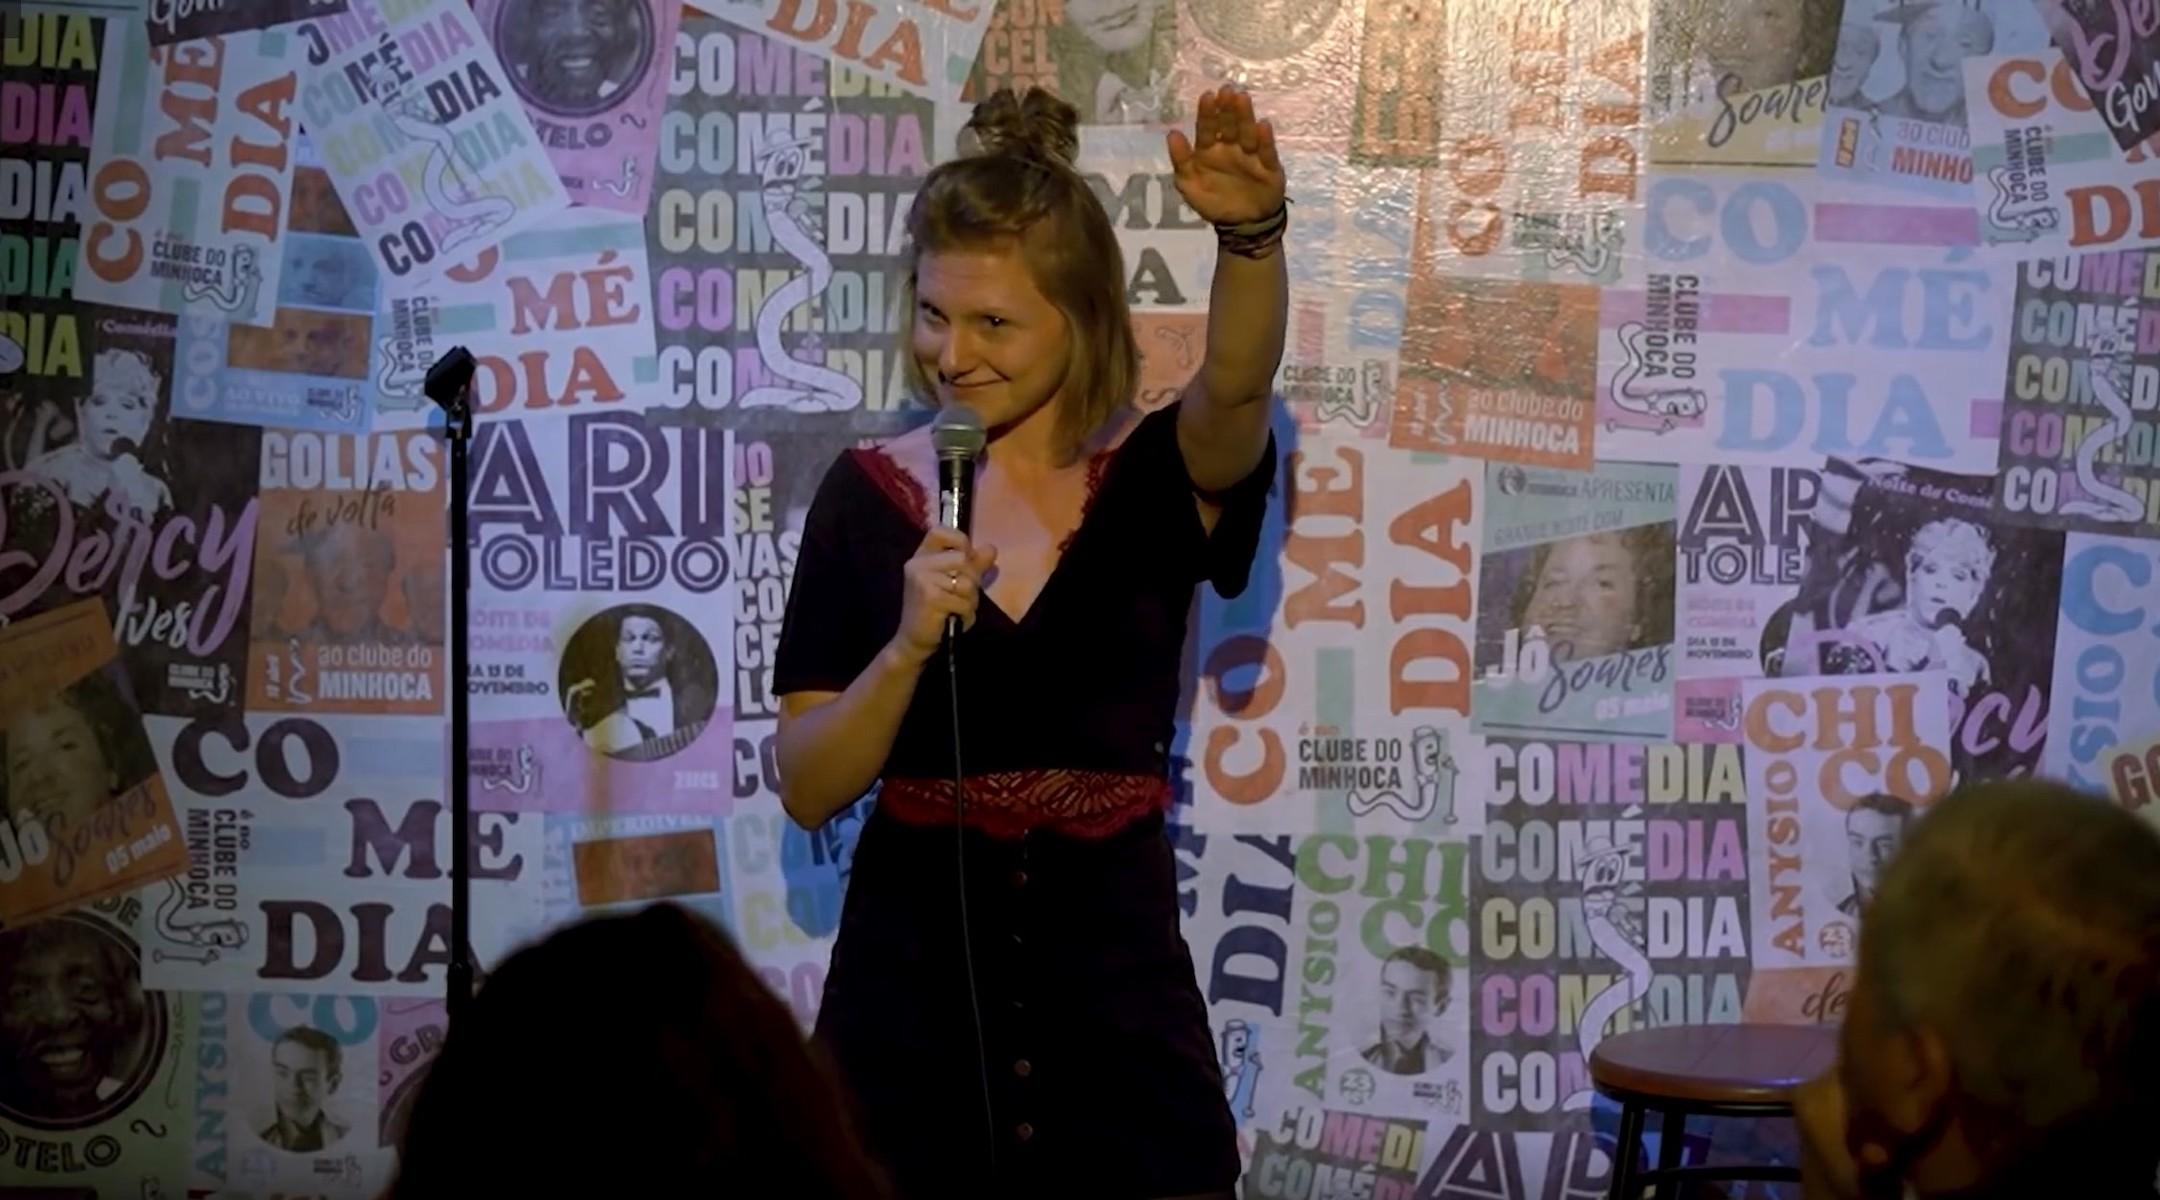 Brazilian Jewish groups slam German comedian for Holocaust joke